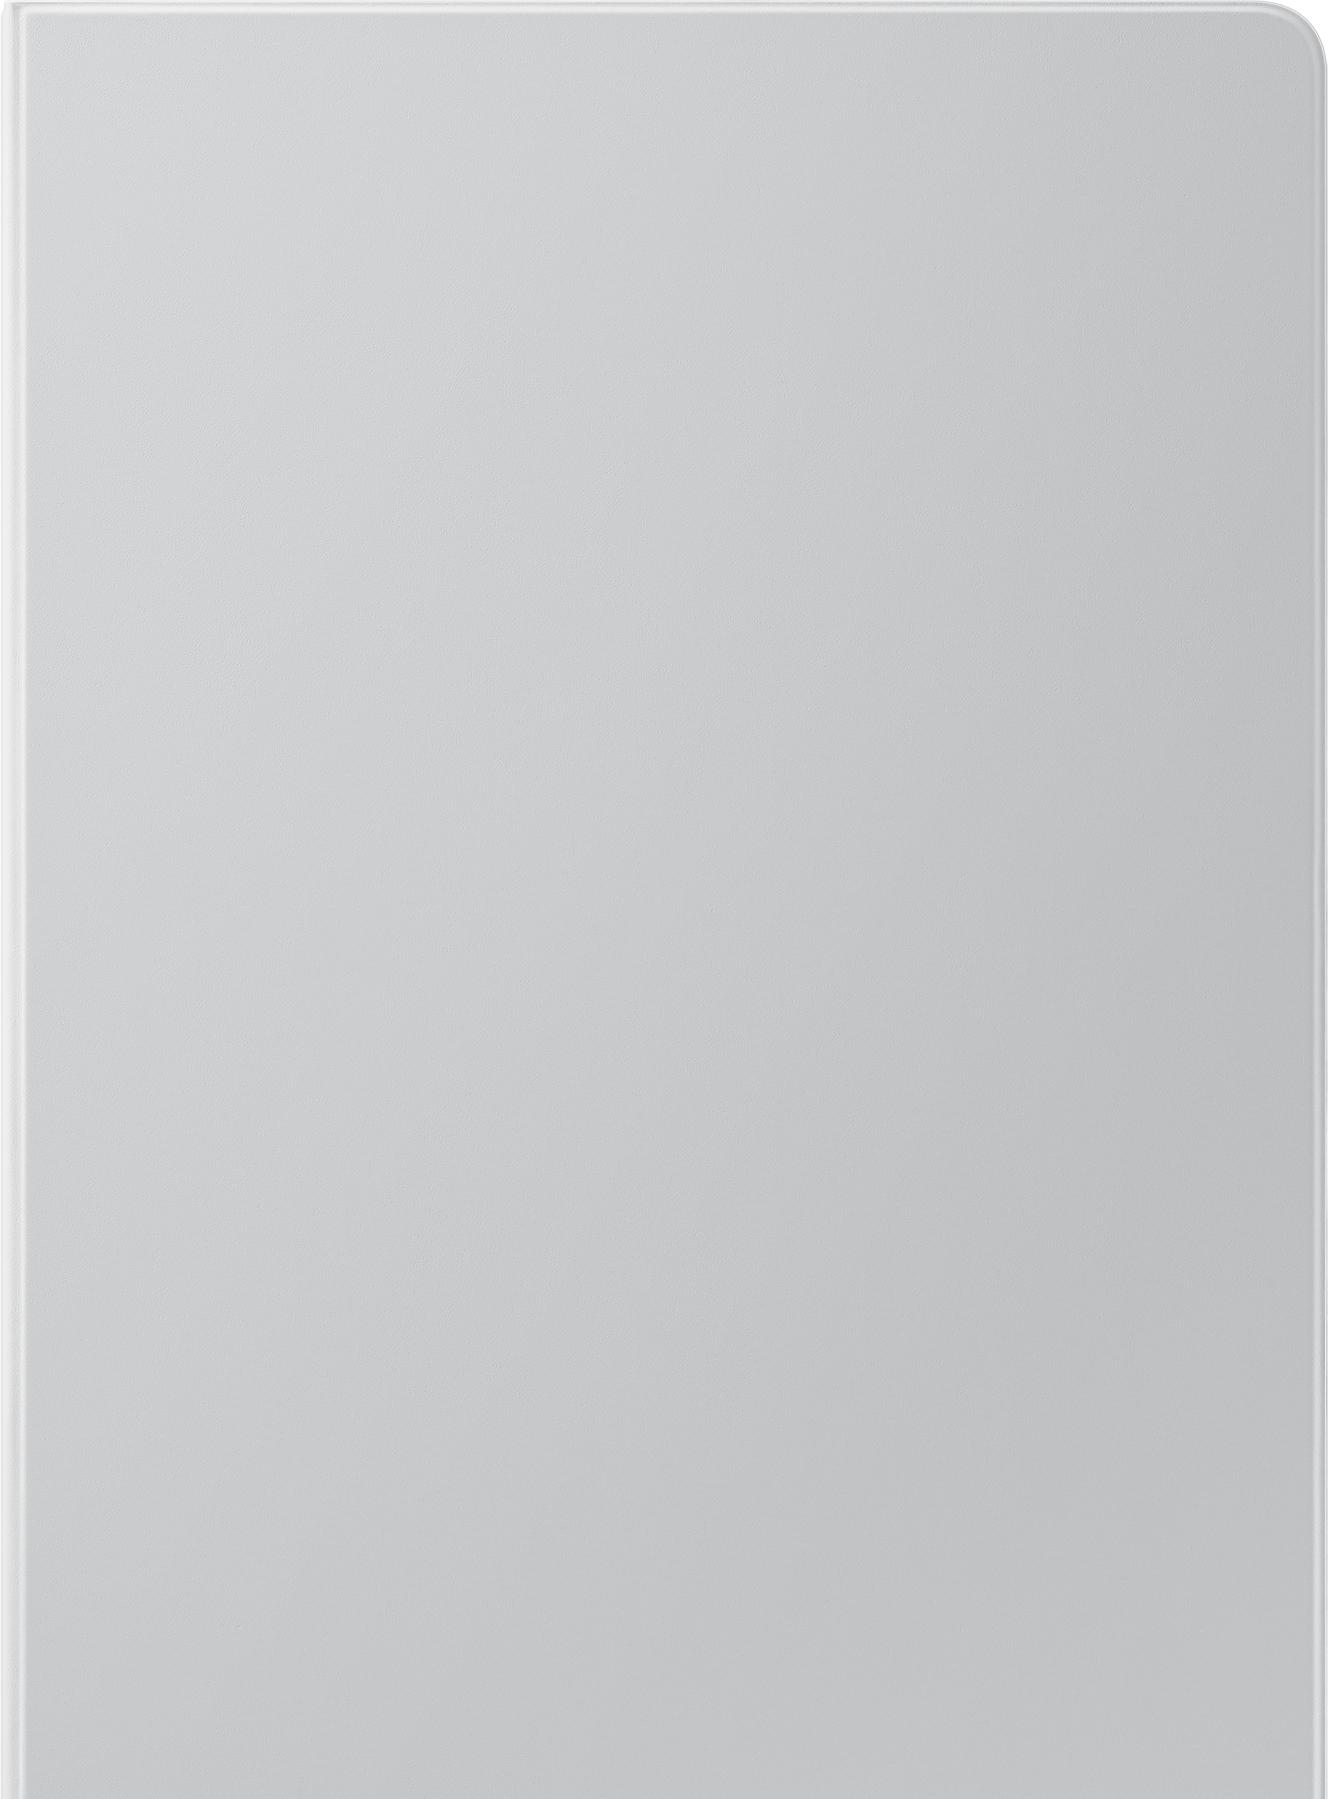 Чехол для планшета Samsung Book Cover для Samsung Galaxy Tab S7+/S7 FE (светло-серый)